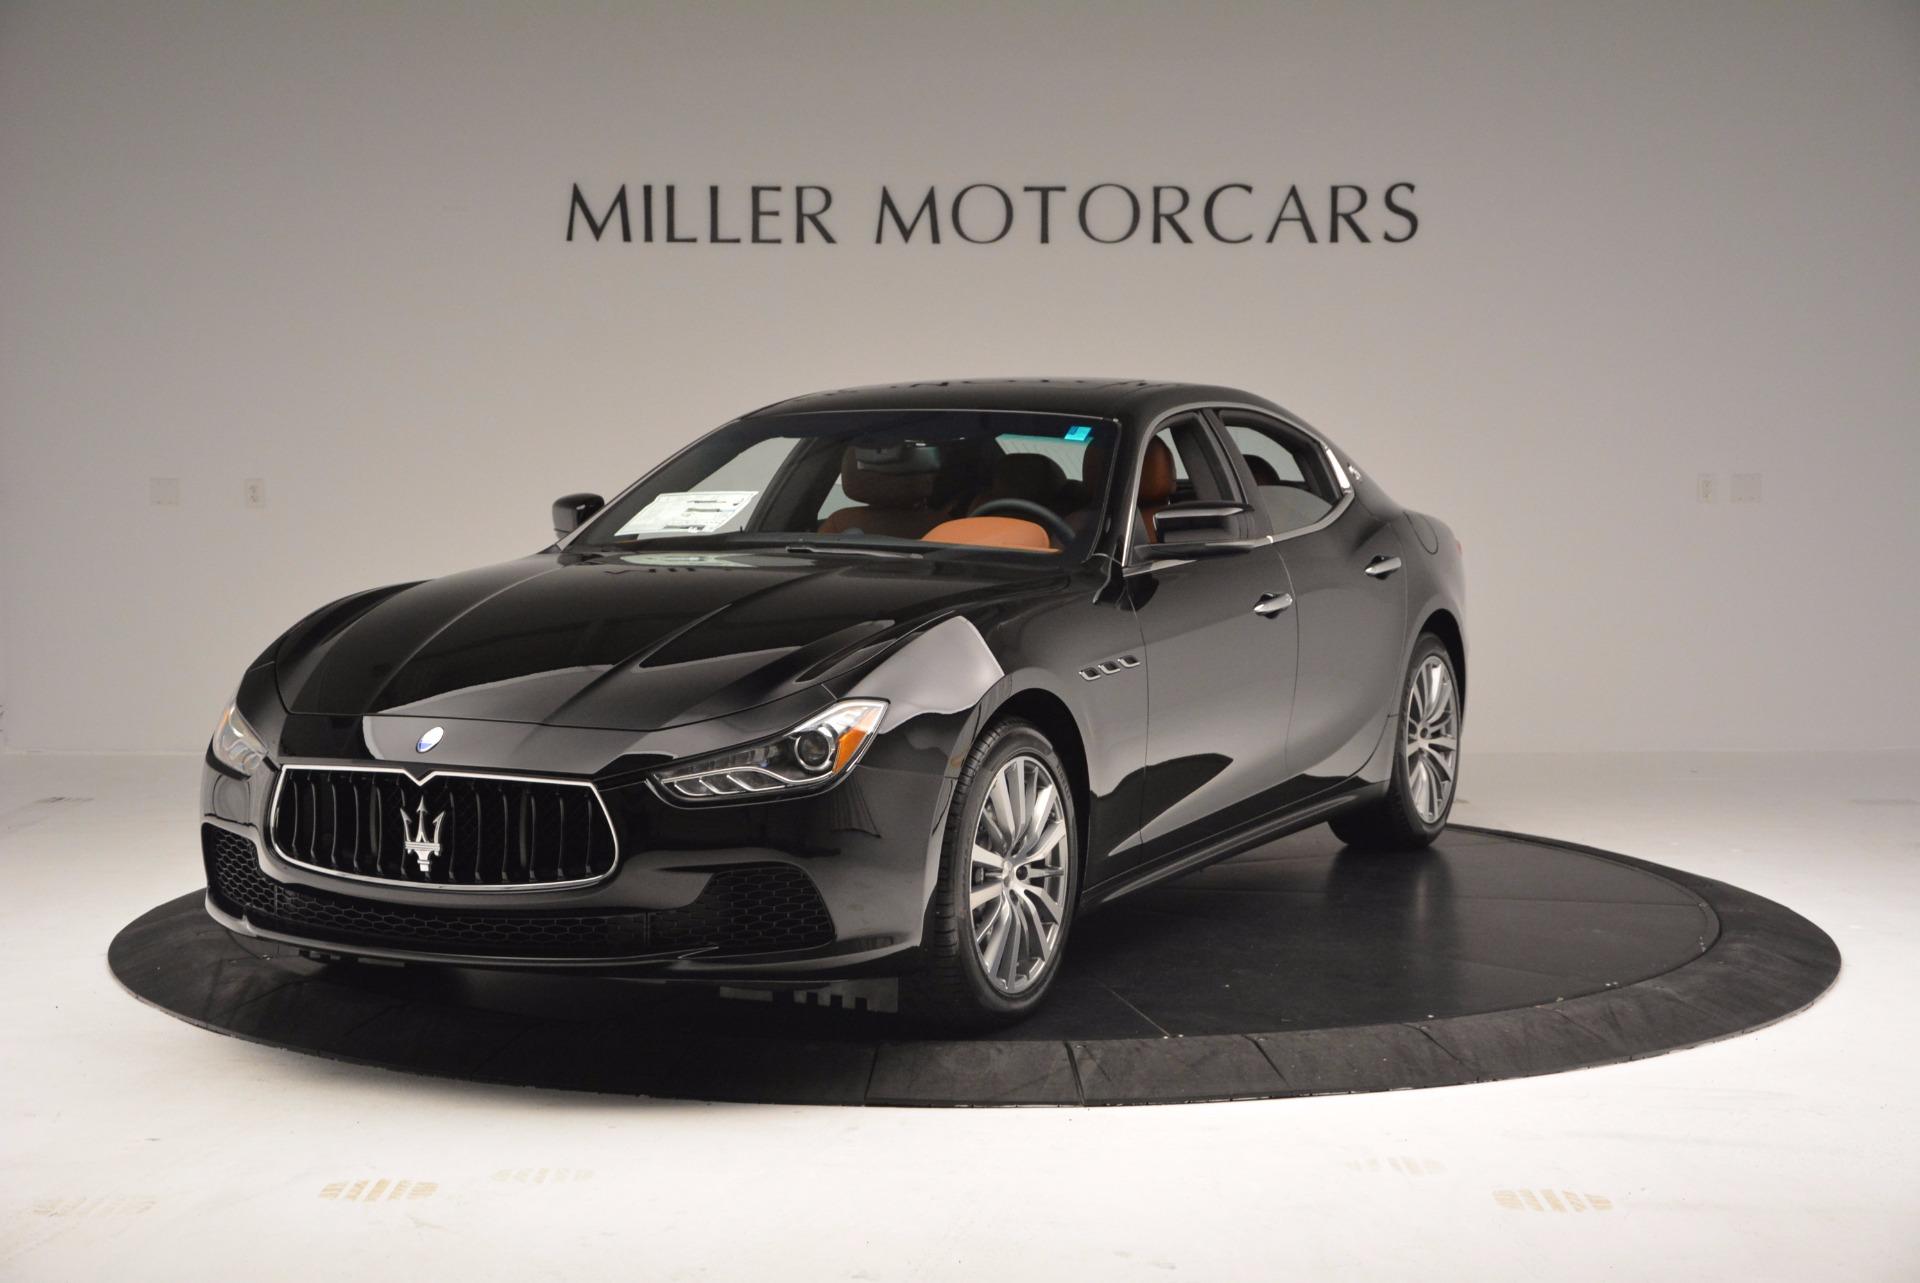 New 2017 Maserati Ghibli S Q4 EX-Loaner For Sale In Westport, CT 1116_main